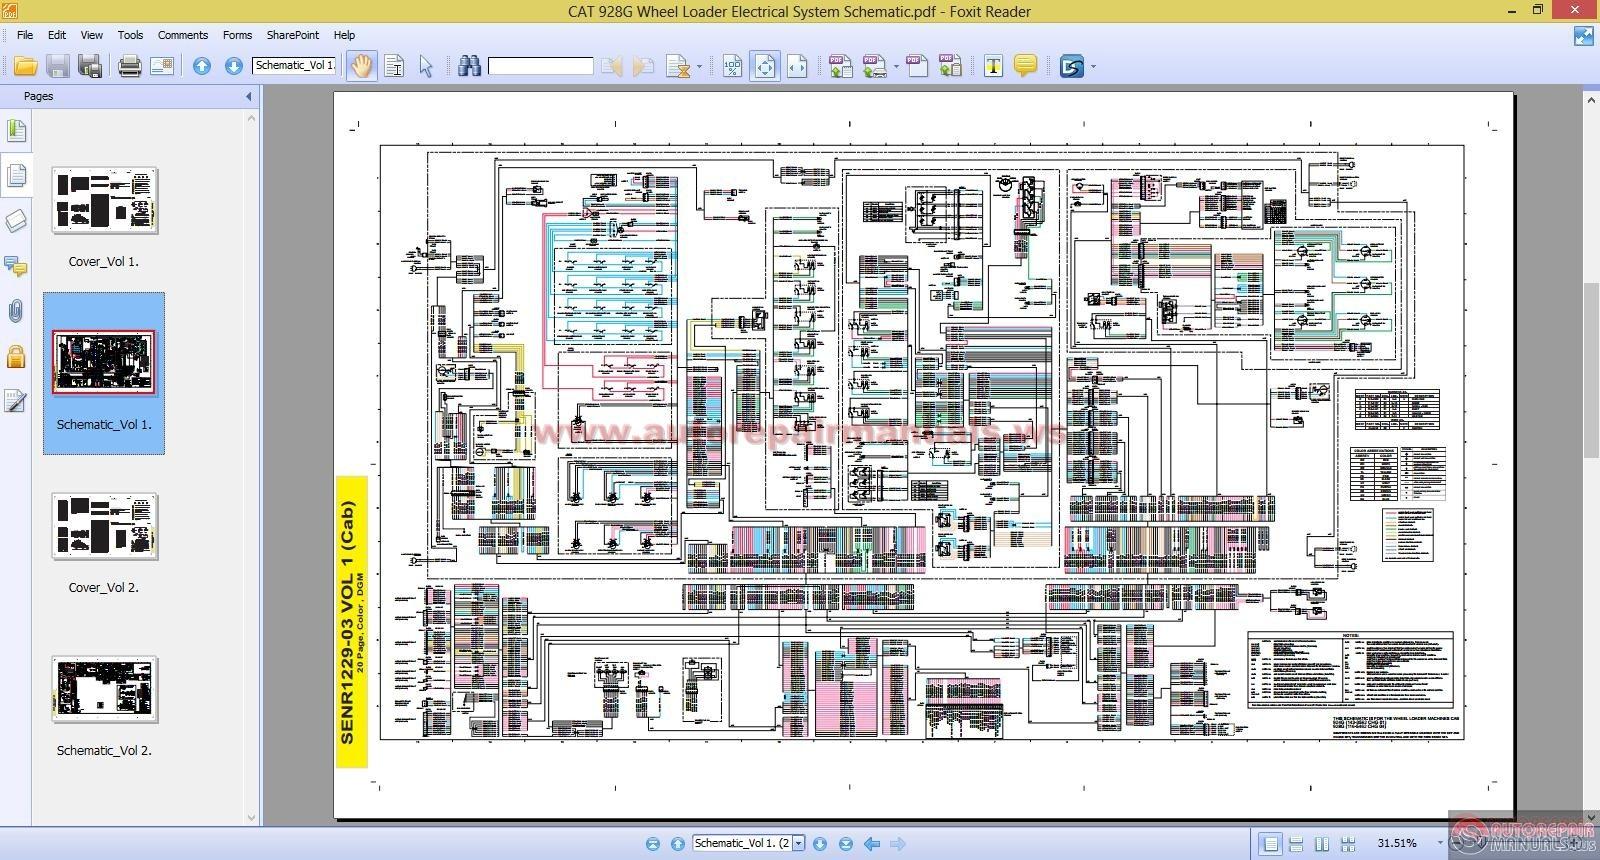 Cat 928g Wiring Diagram